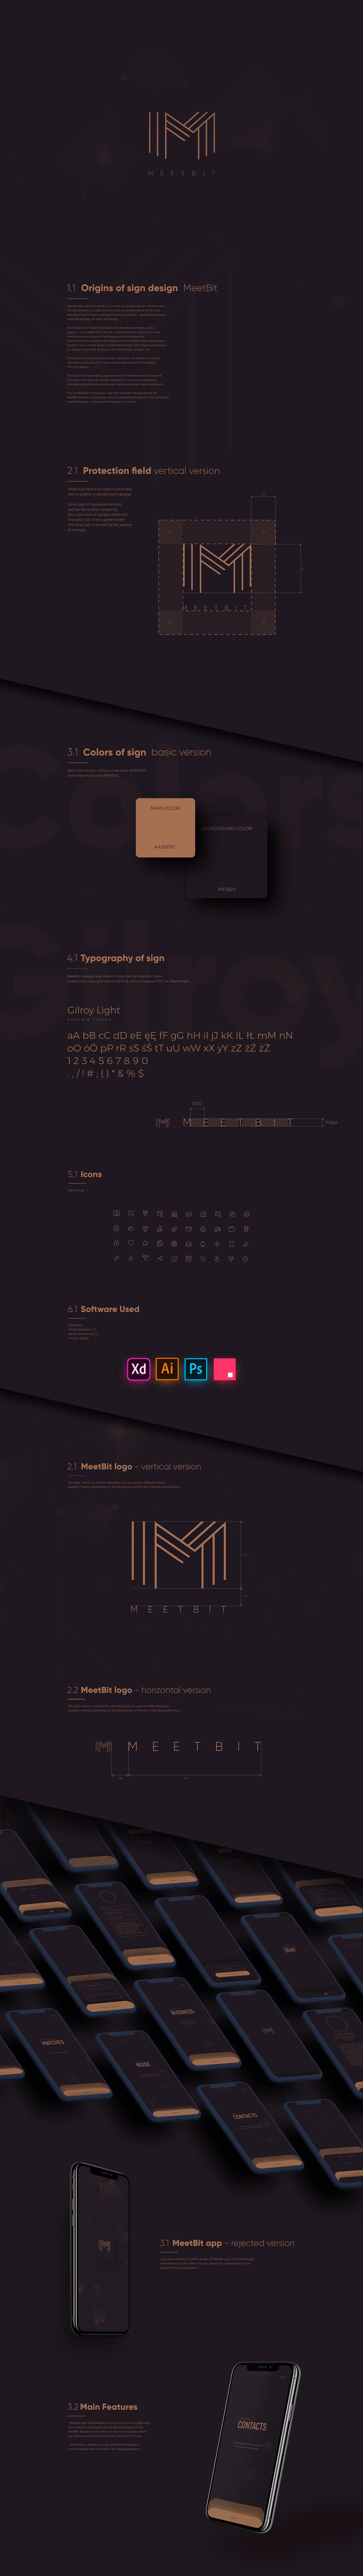 brand,design,font,graphic,minimalistic,poland,Szczecin,typography  ,vector,visual identification